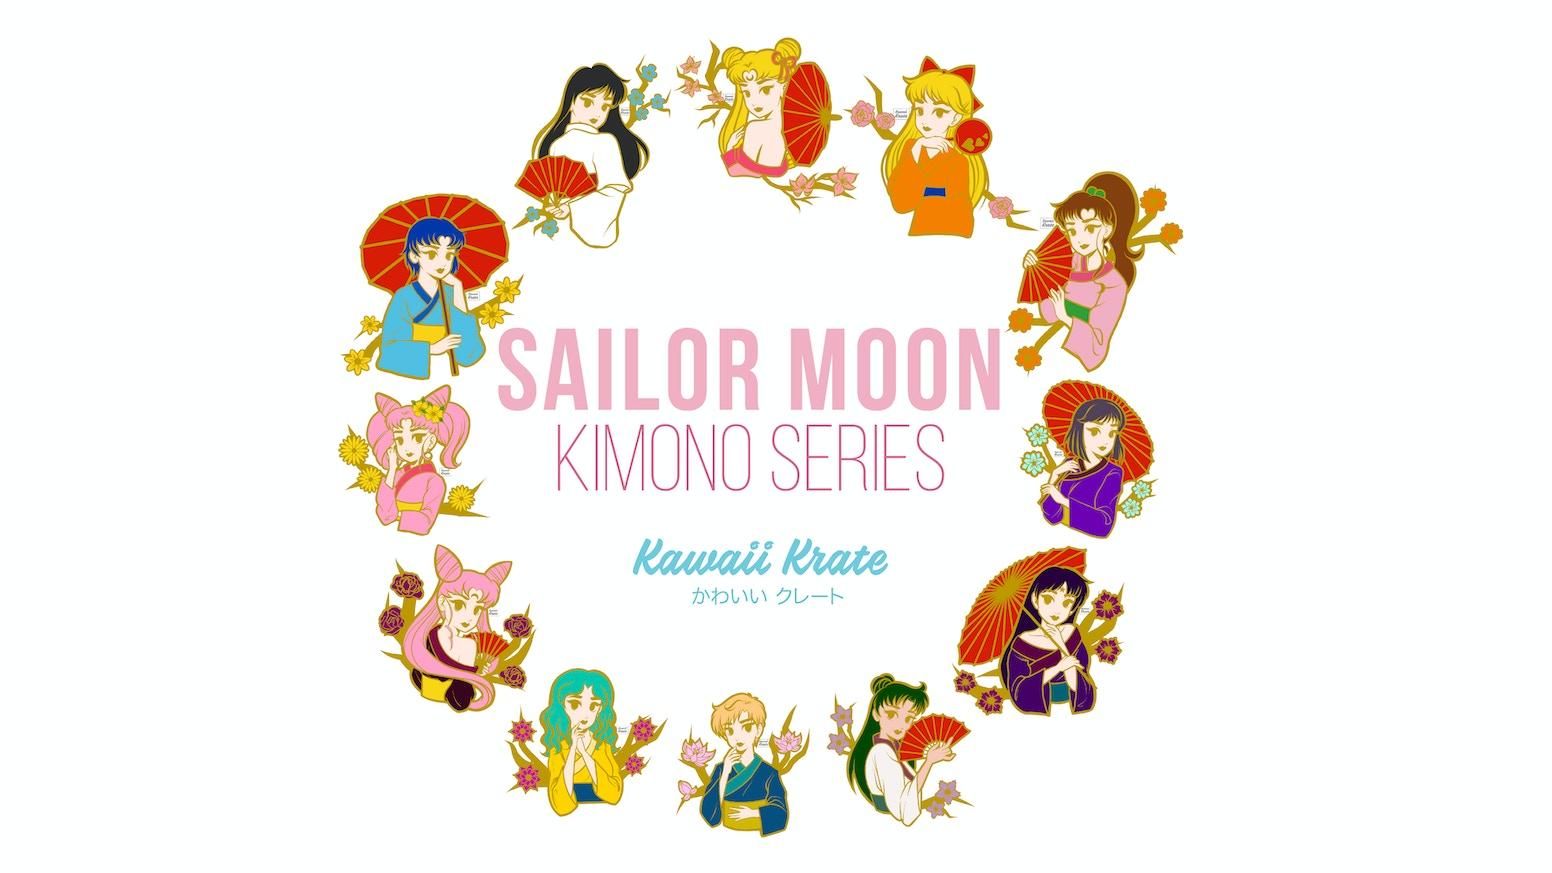 Kawaii Krate's Kimono Series Pin Designs of Sailor Moon Characters